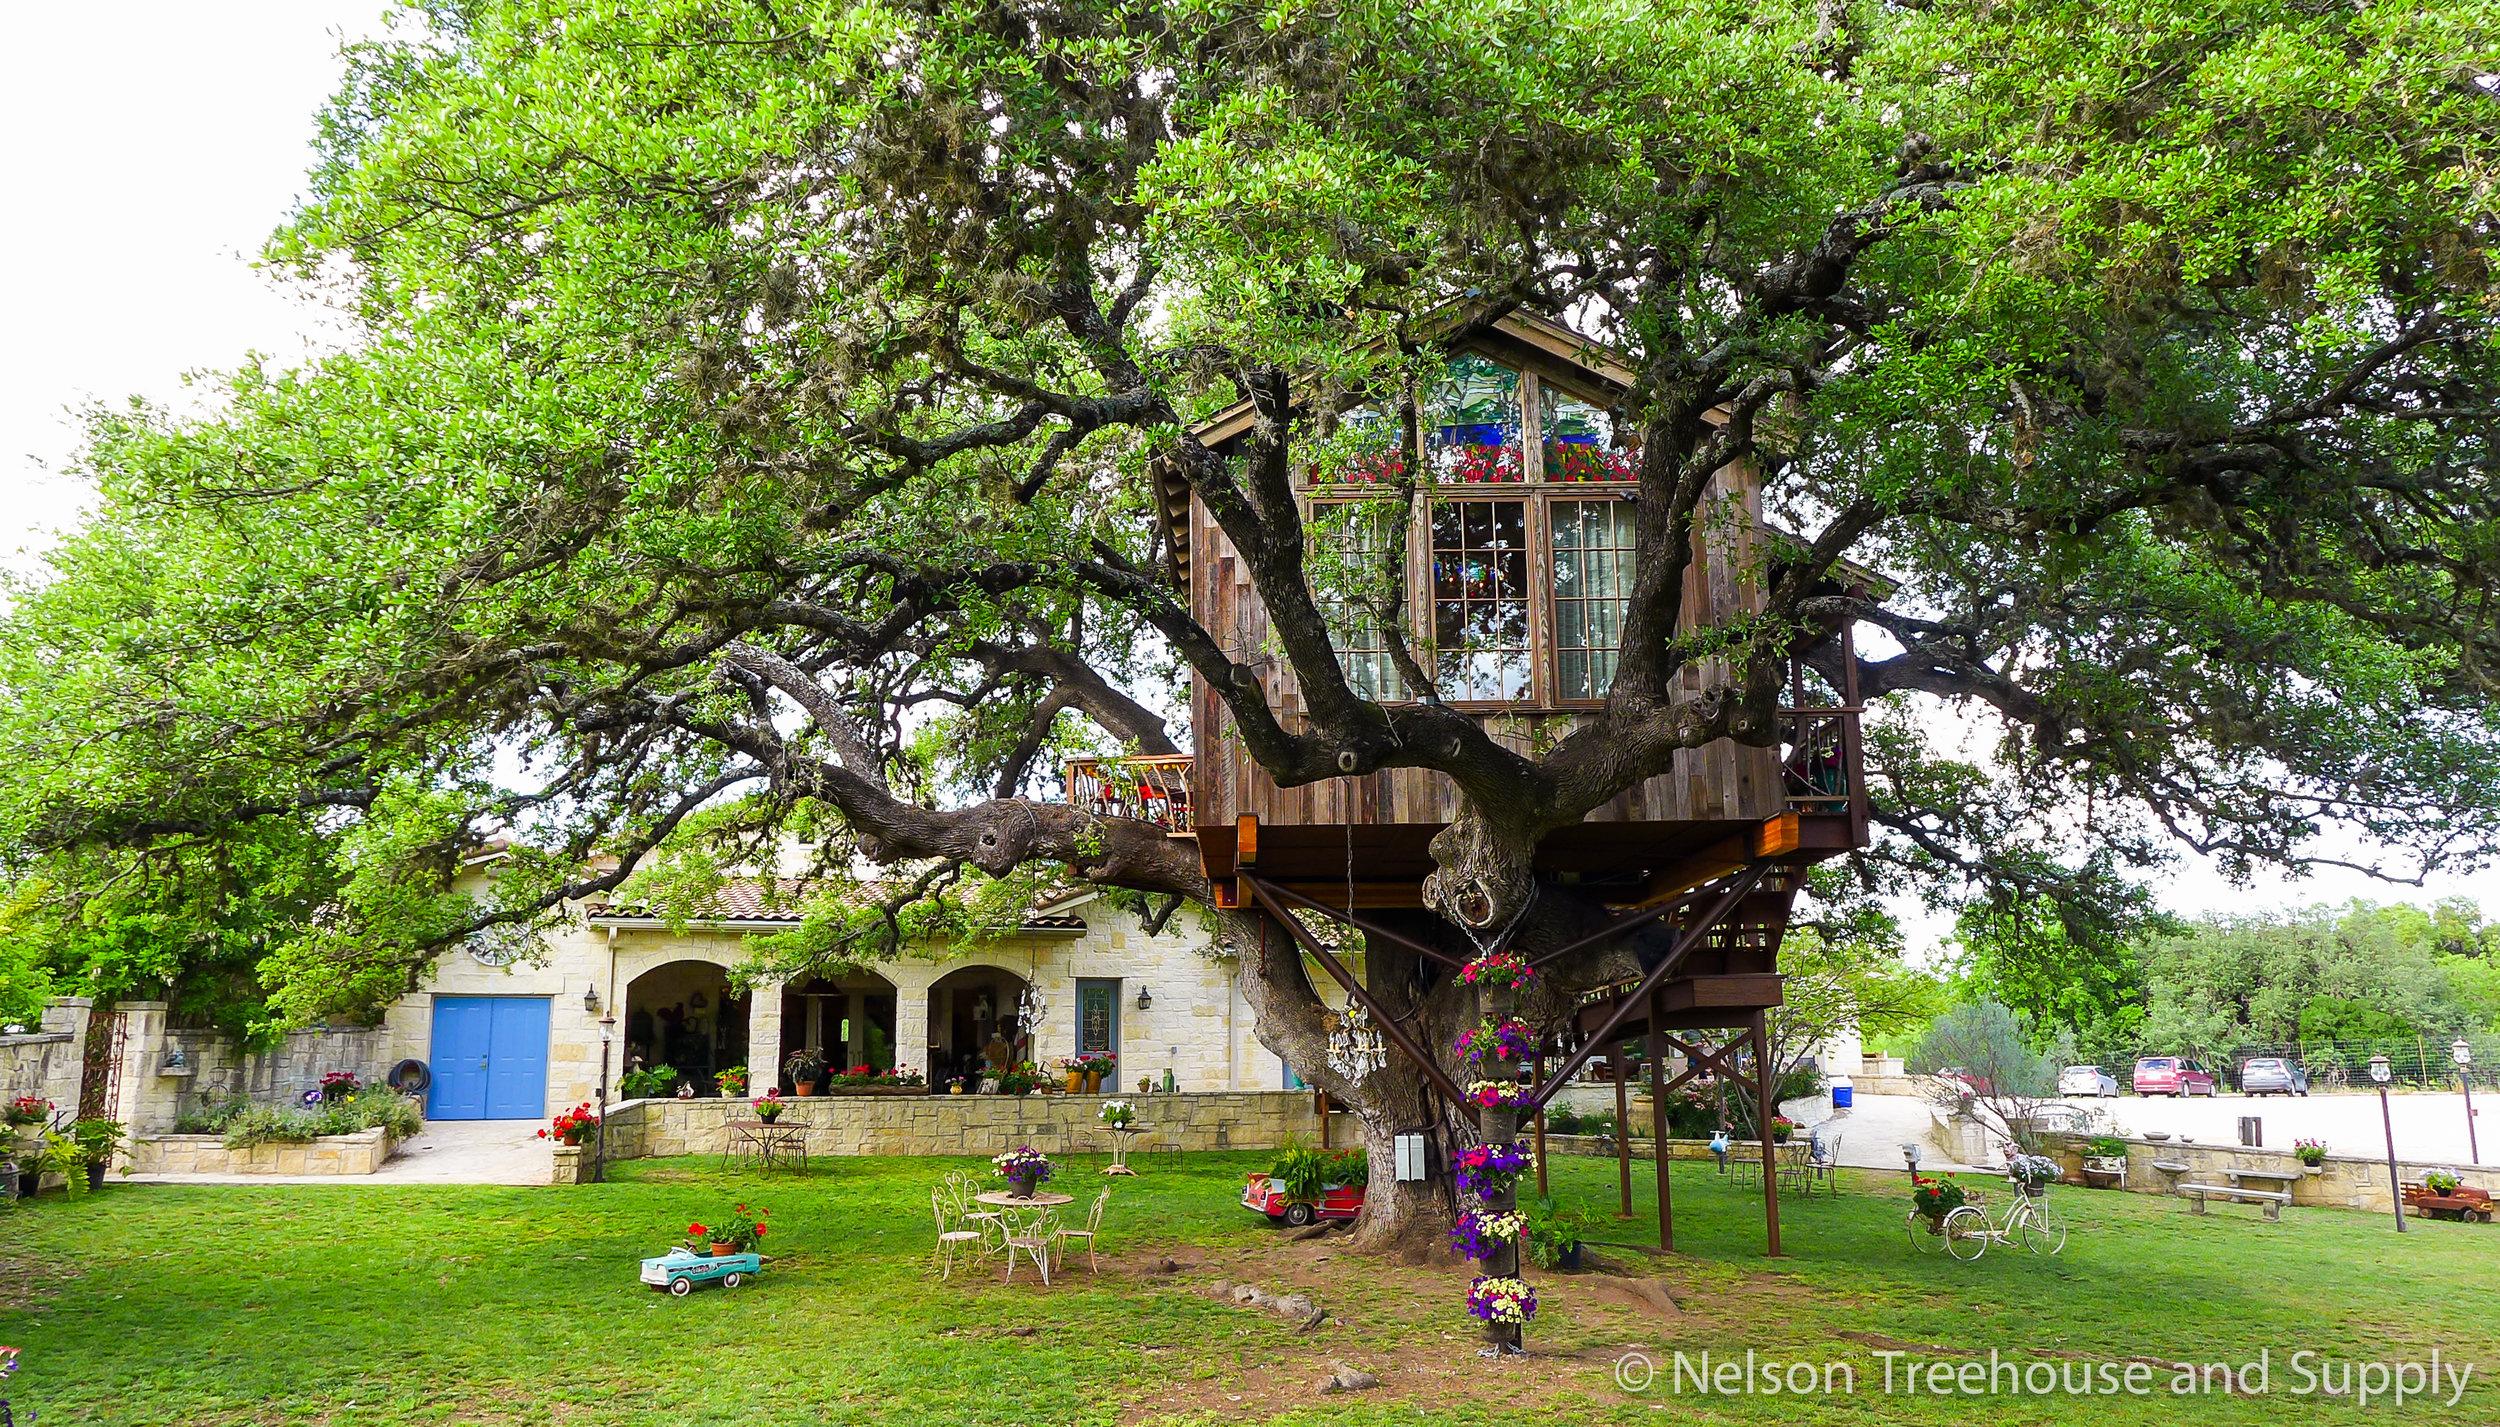 laurel-restaurant-treehouse-exterior-4